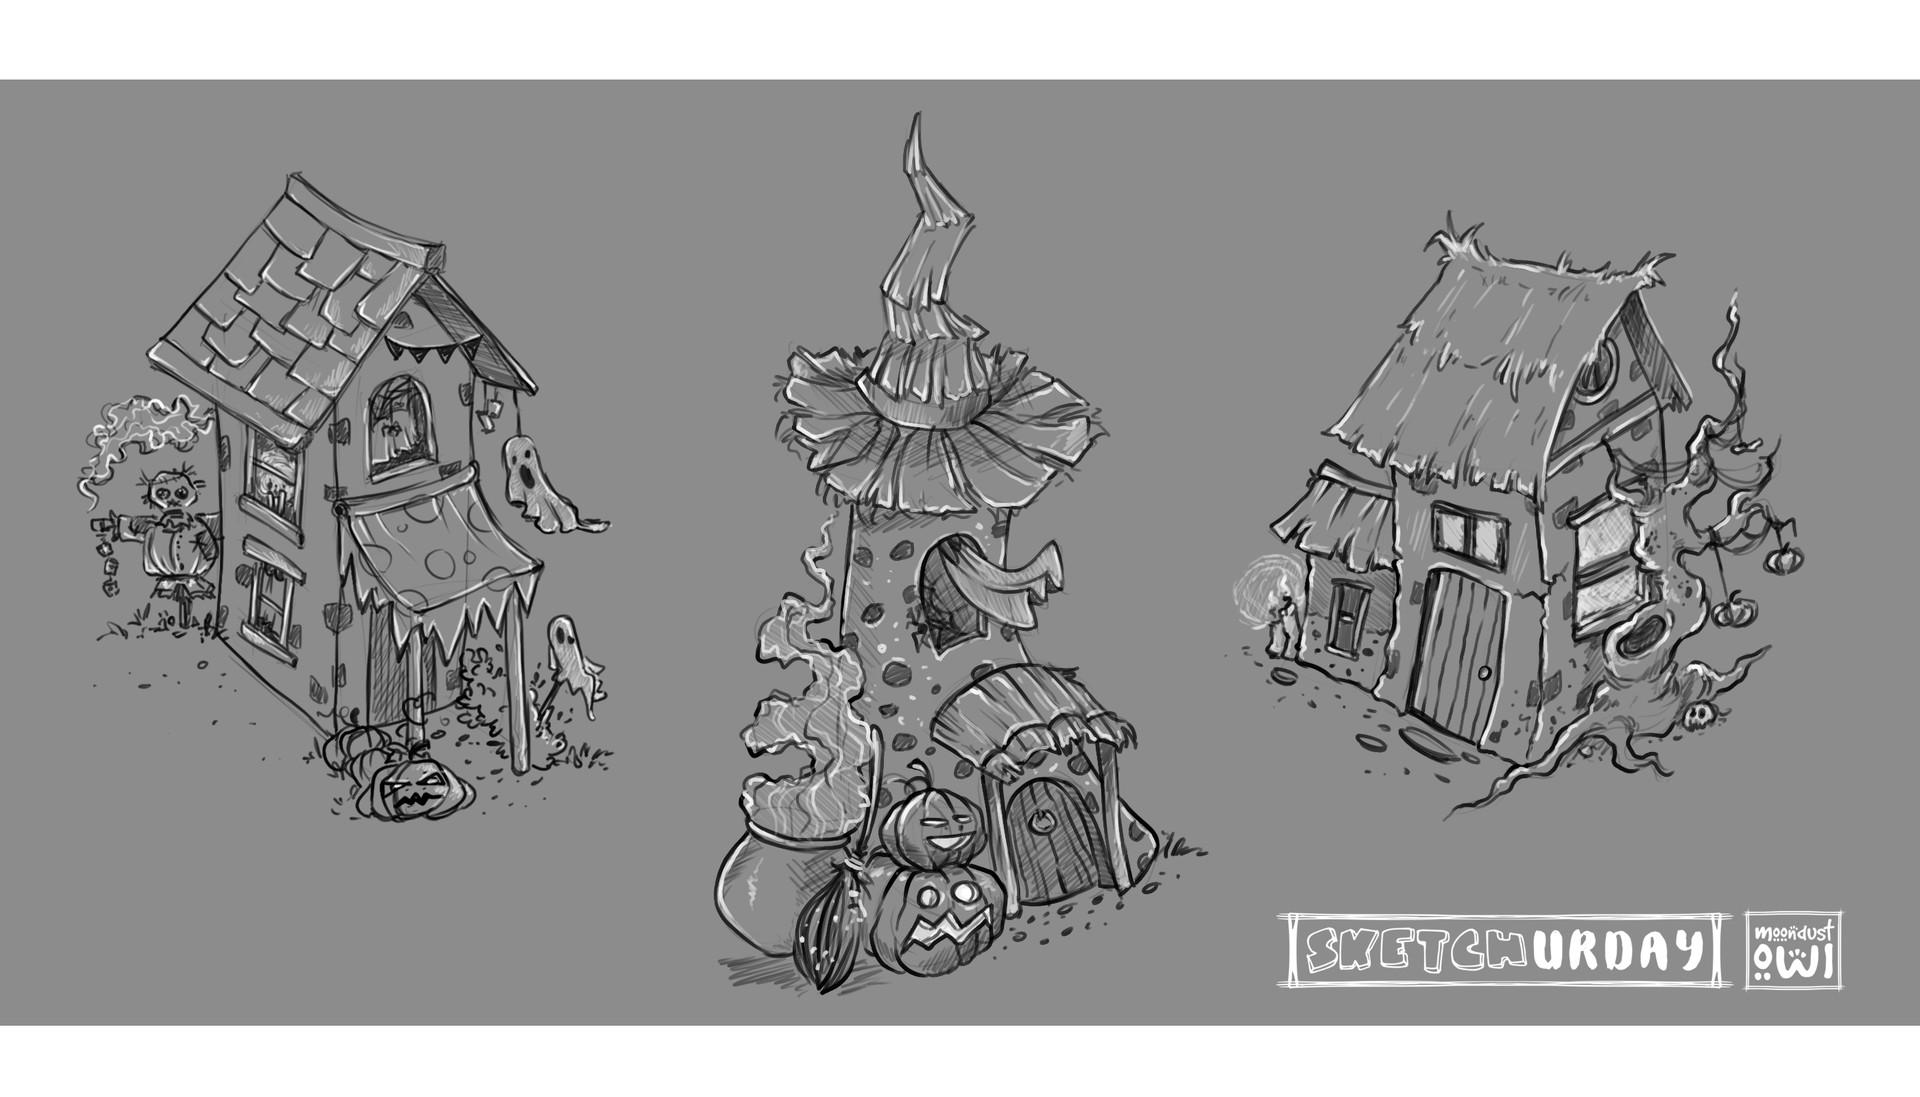 Zita banyai sd60 spookyhouses